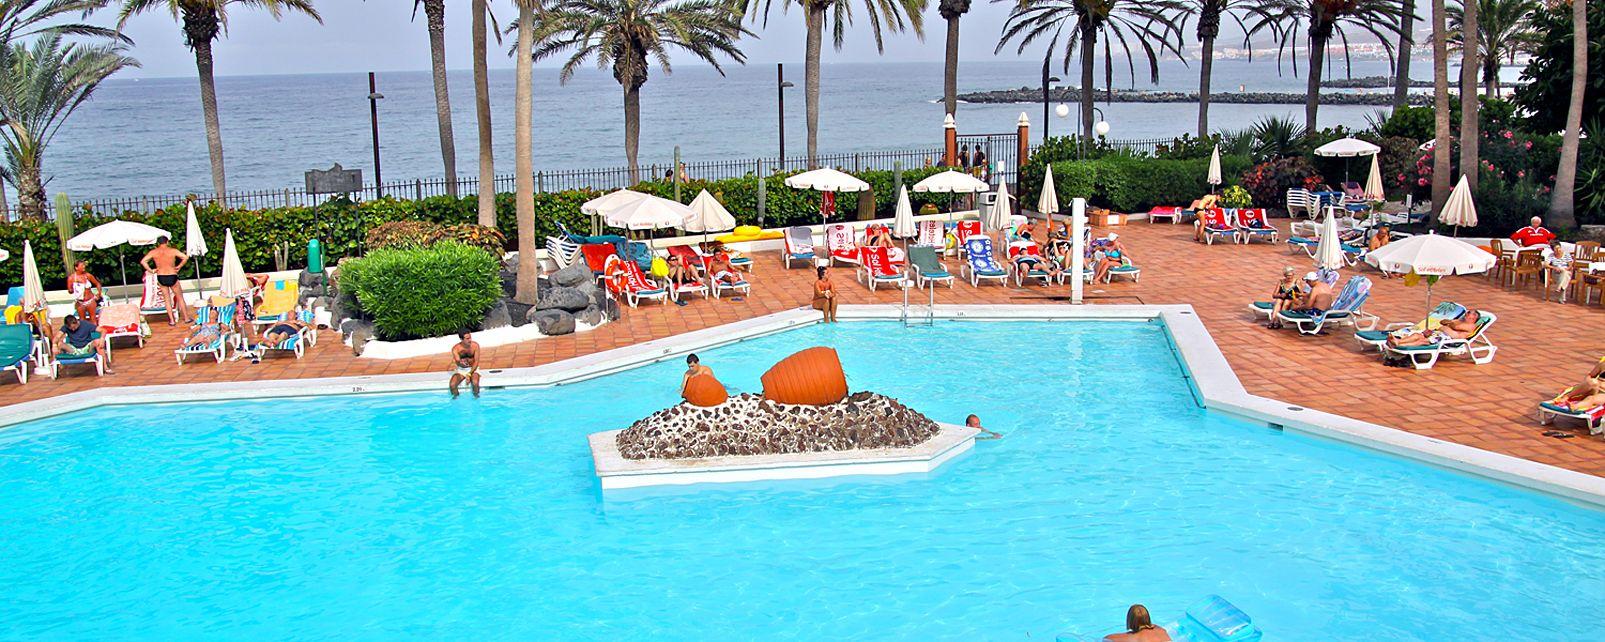 Hotel sol tenerife in playa de las americas - Hotel sol puerto playa tenerife ...